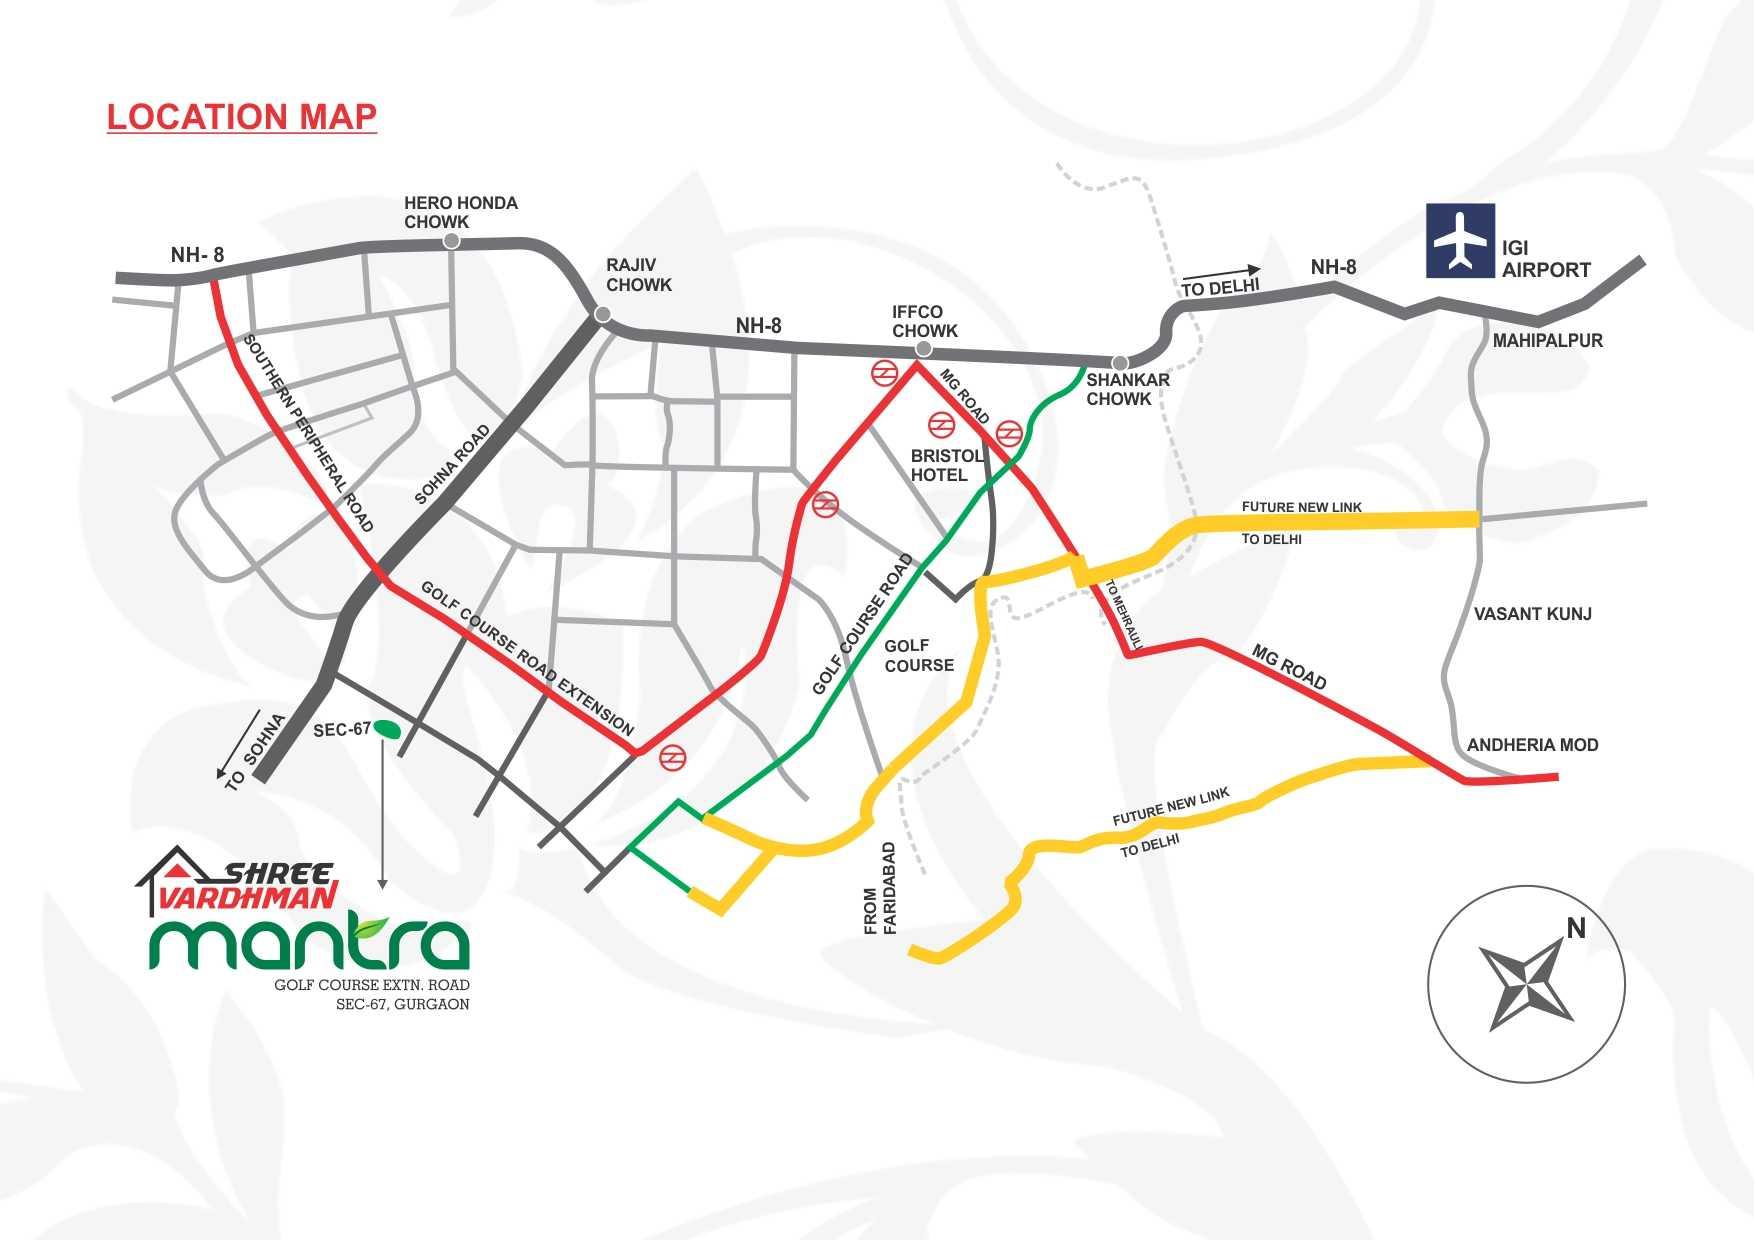 Shree Vardhman Mantra - Location Map